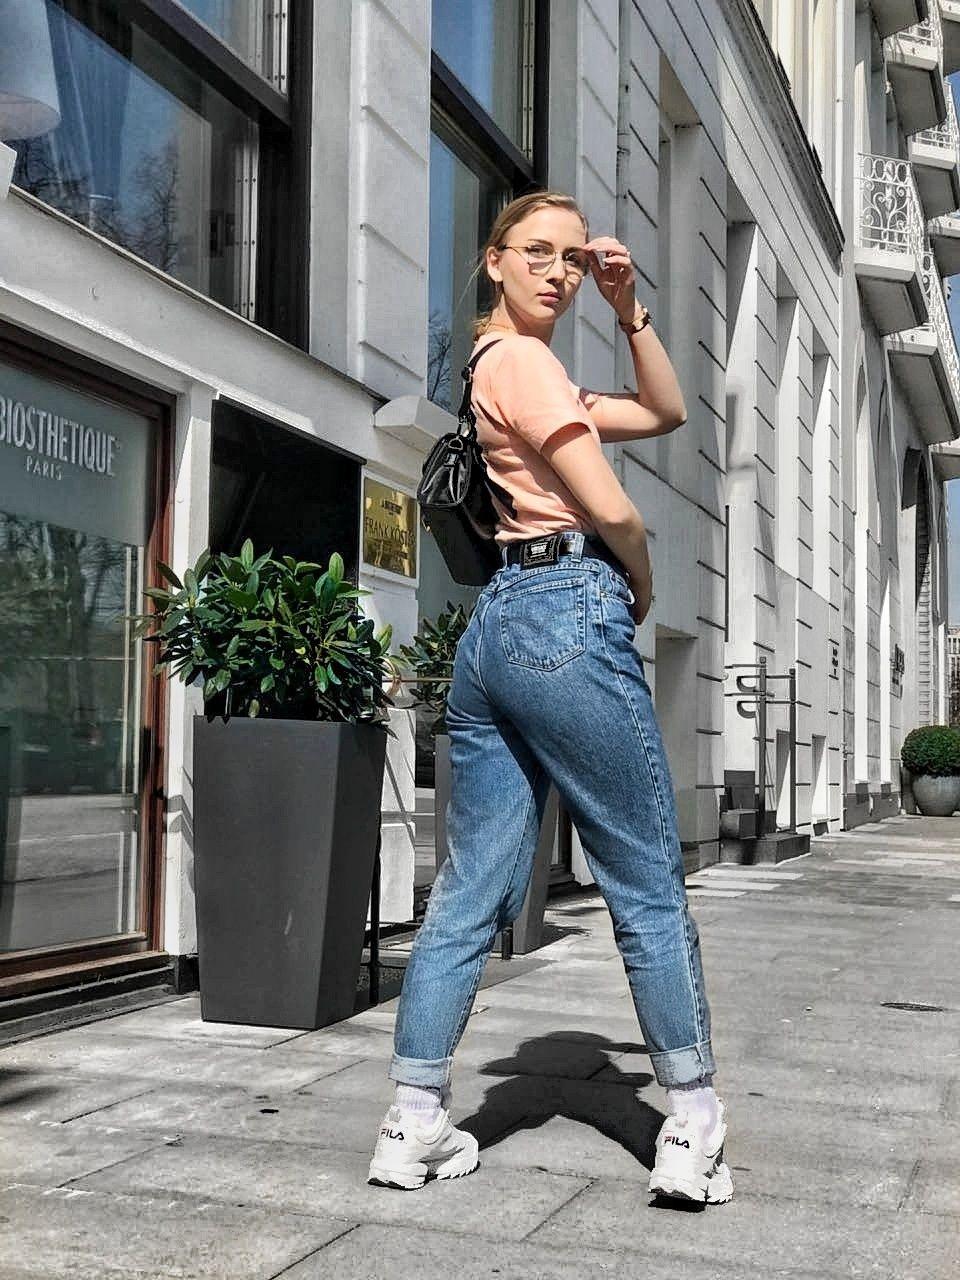 27e936d59d434 streetstyle inspiration inspo style fashion news versace jeans blue mom  jeans black bag nyy tee new york yankees rayban glasses fila disruptor